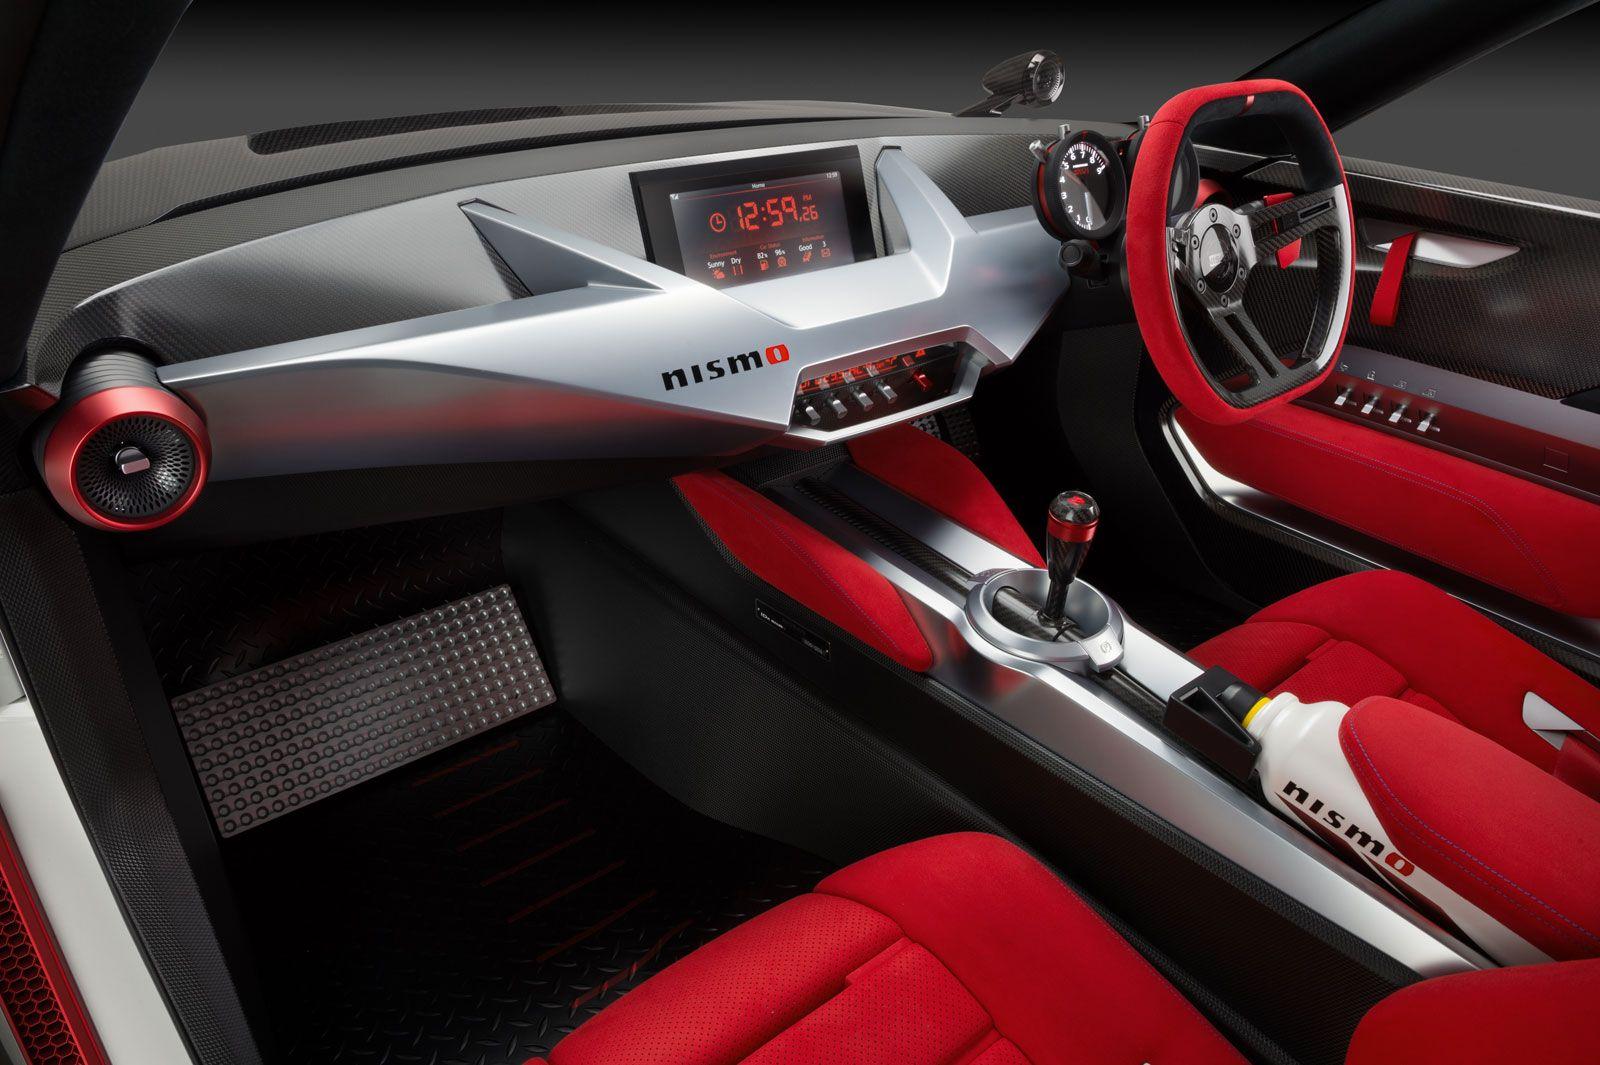 Nissan Idx Nismo Concept Interior With Images Car Interior